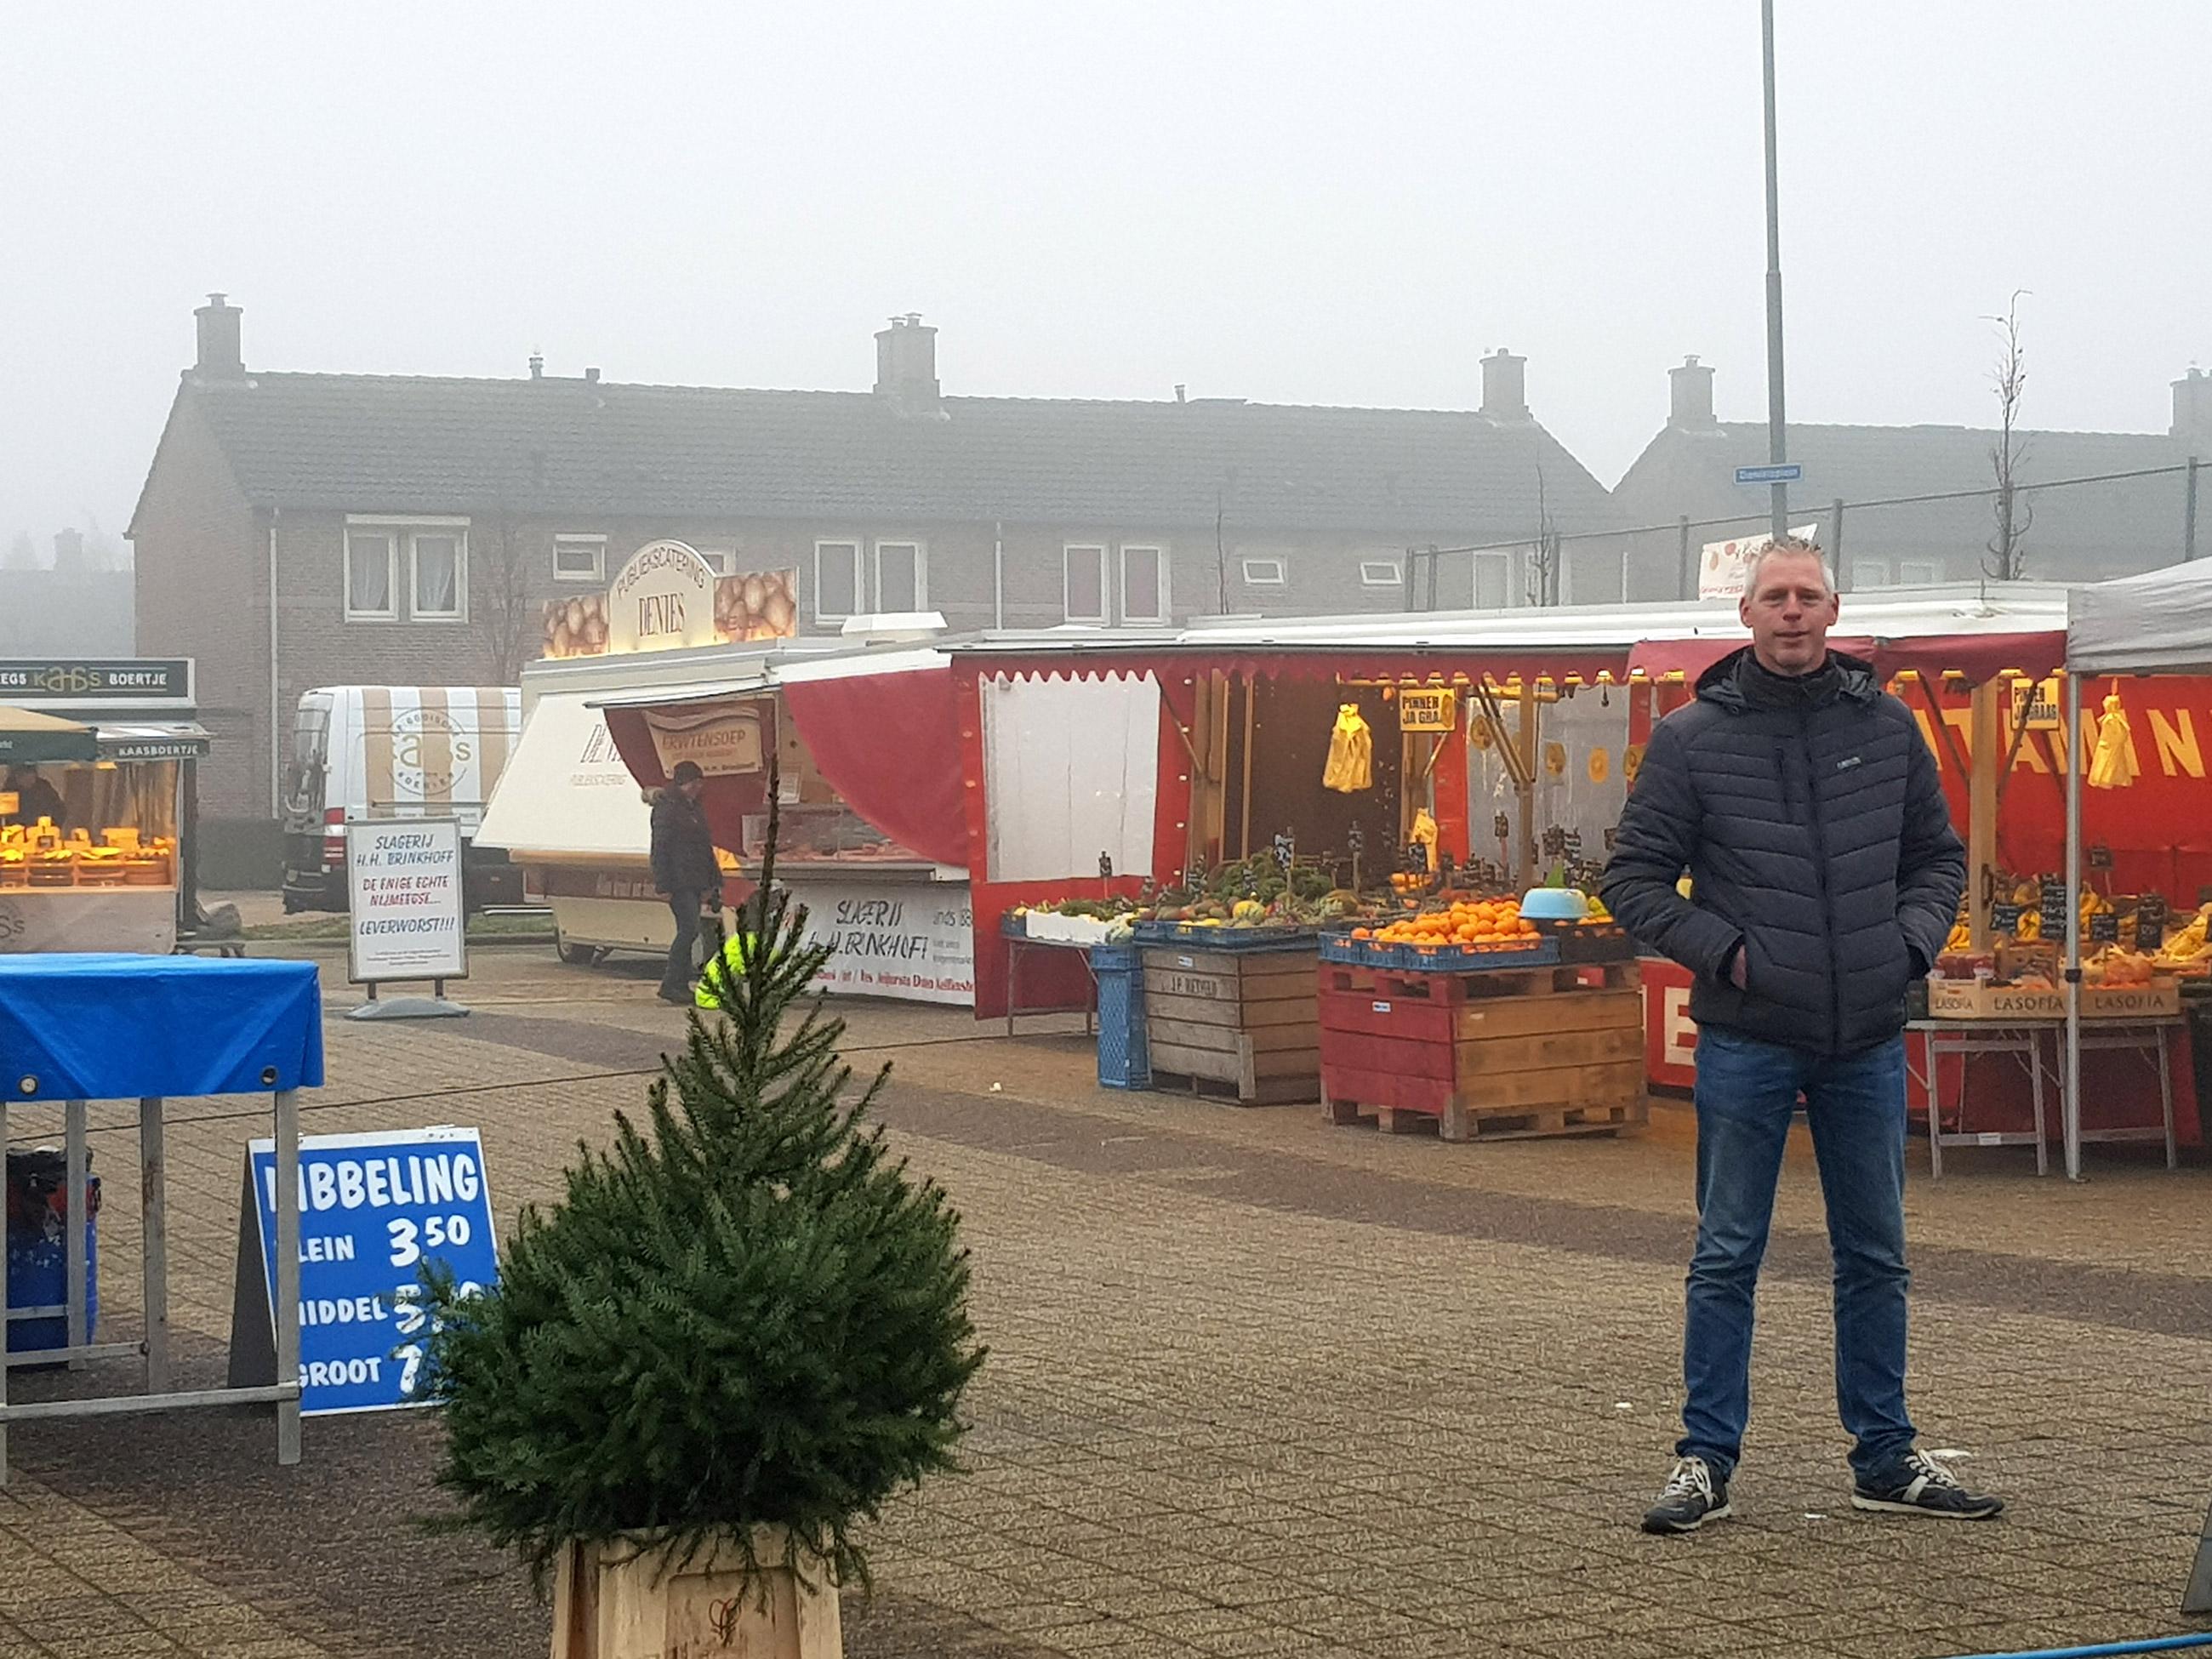 Markt Heseveld: Lust jij een plakje worst?